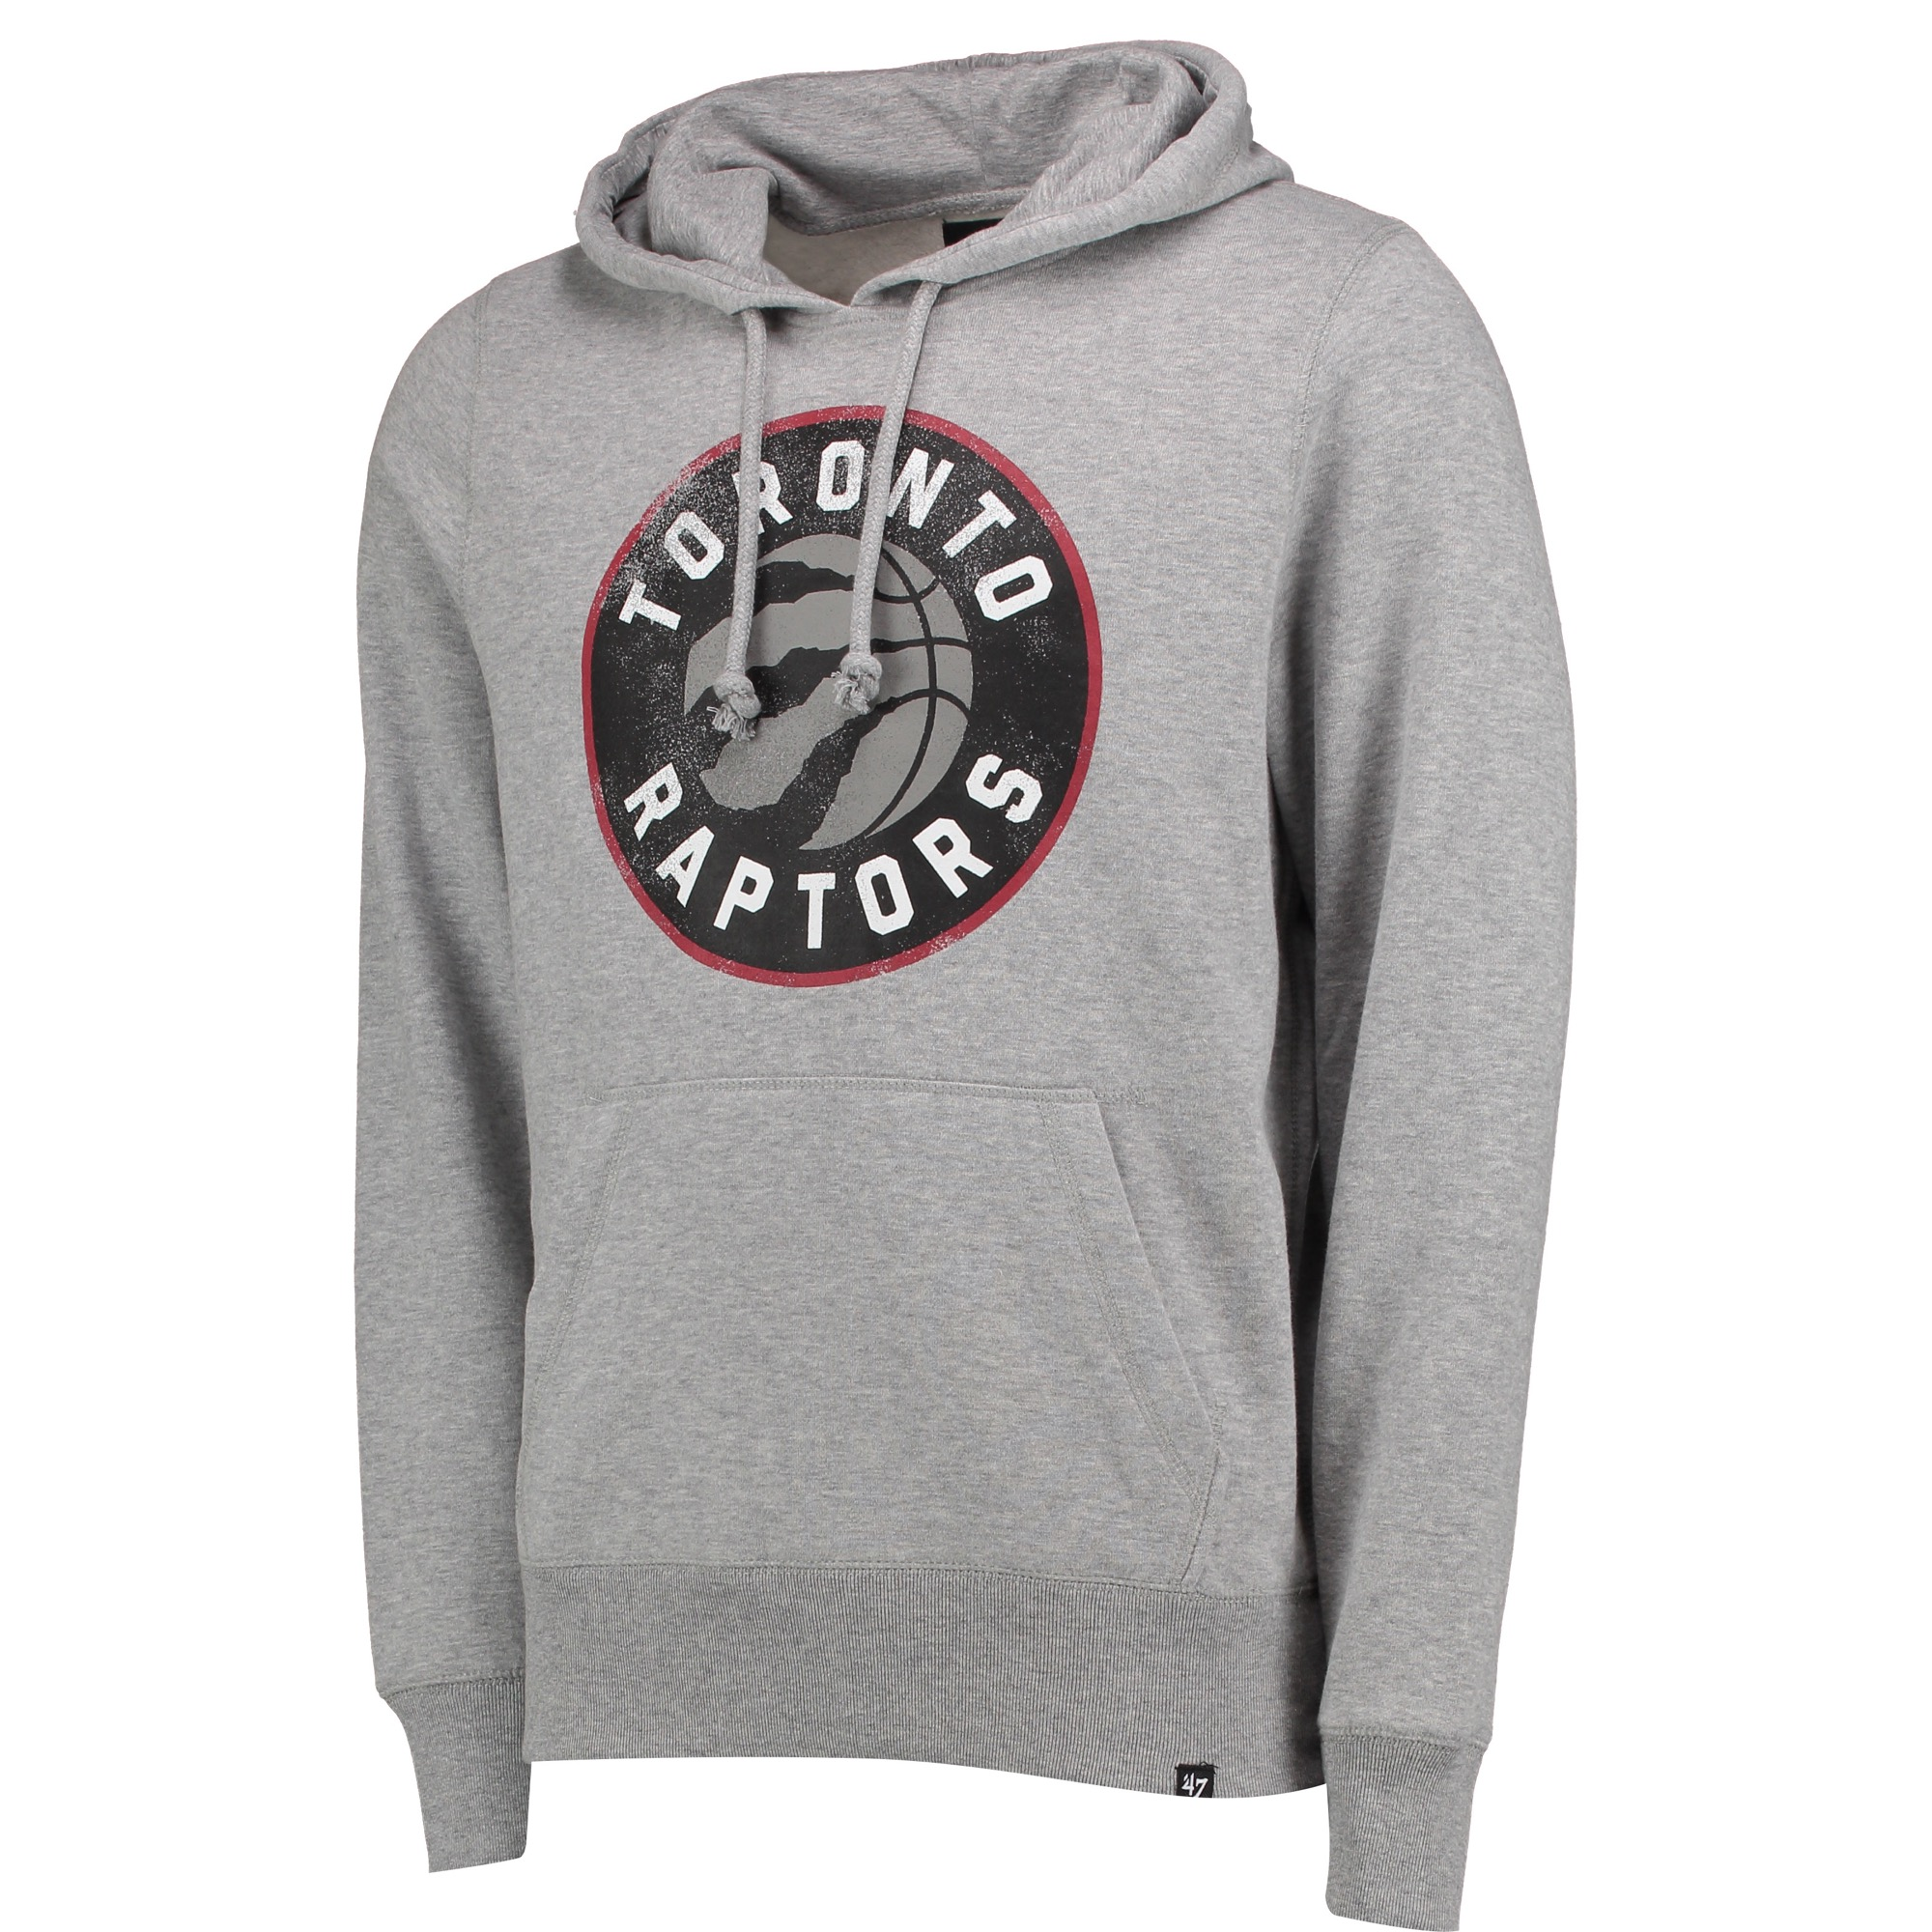 Toronto Raptors 47 Core Knockaround Hoodie - Mens